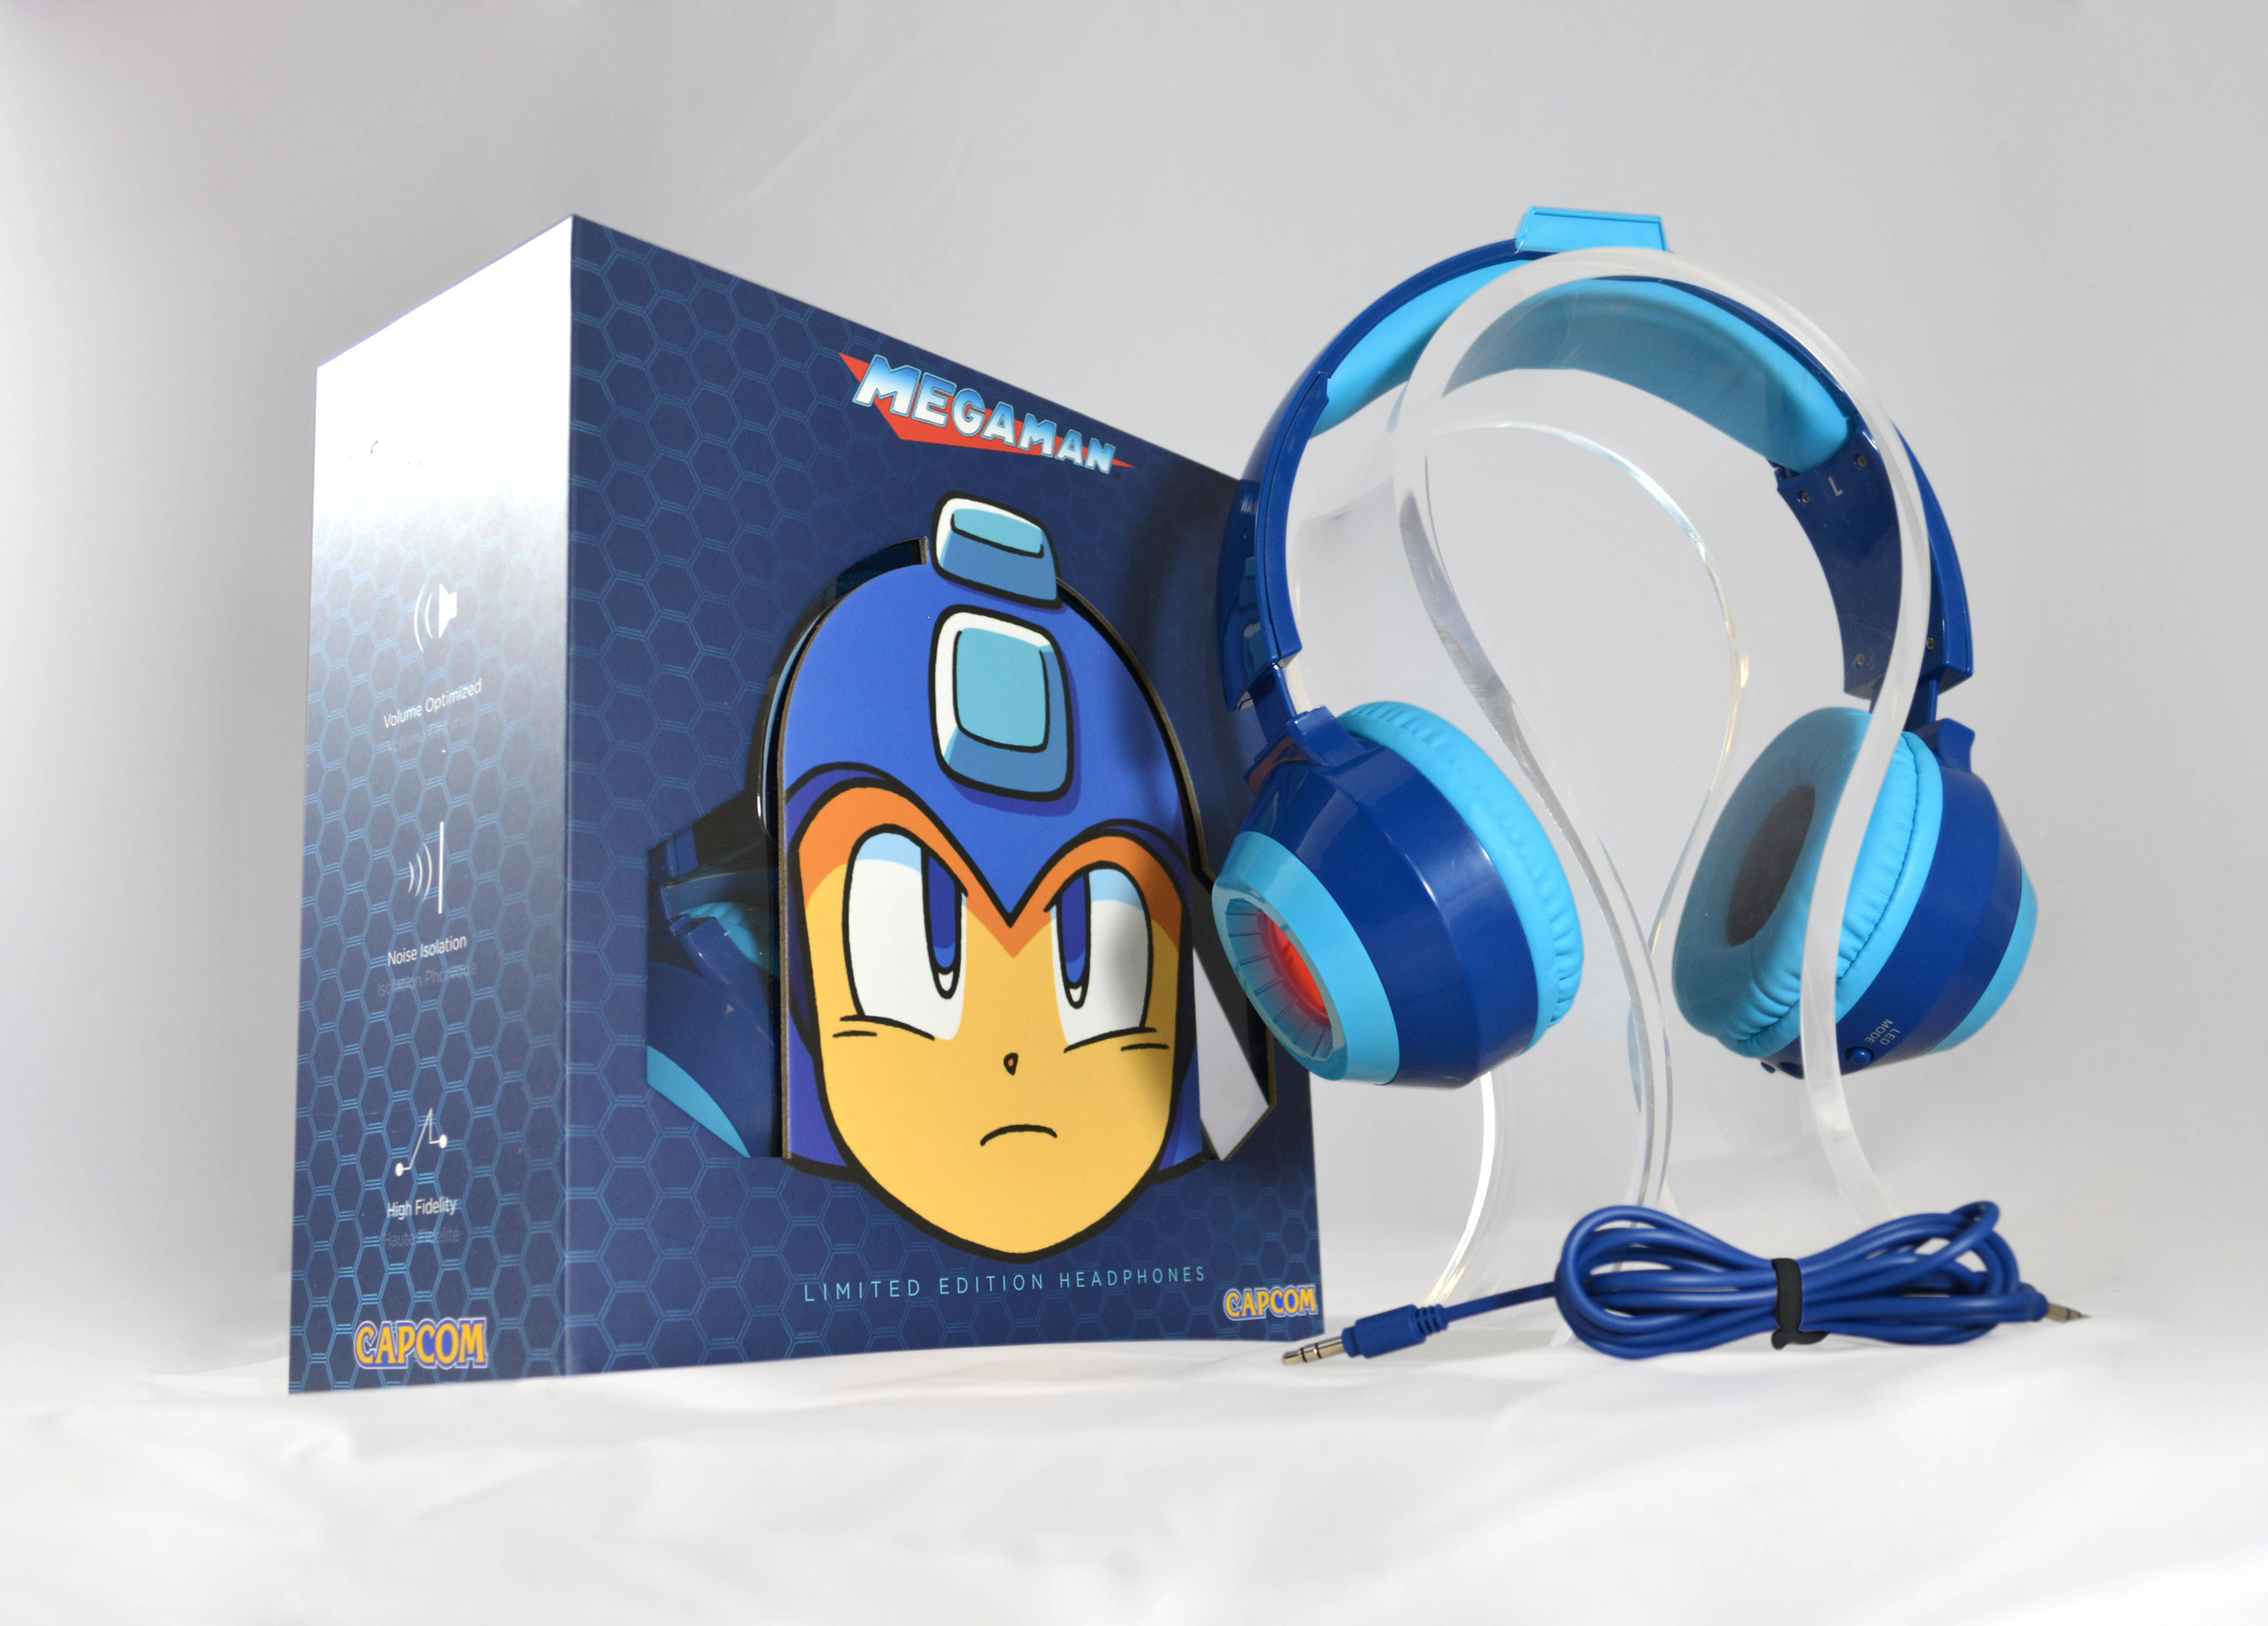 Official Mega Man™ Limited Edition Headphones